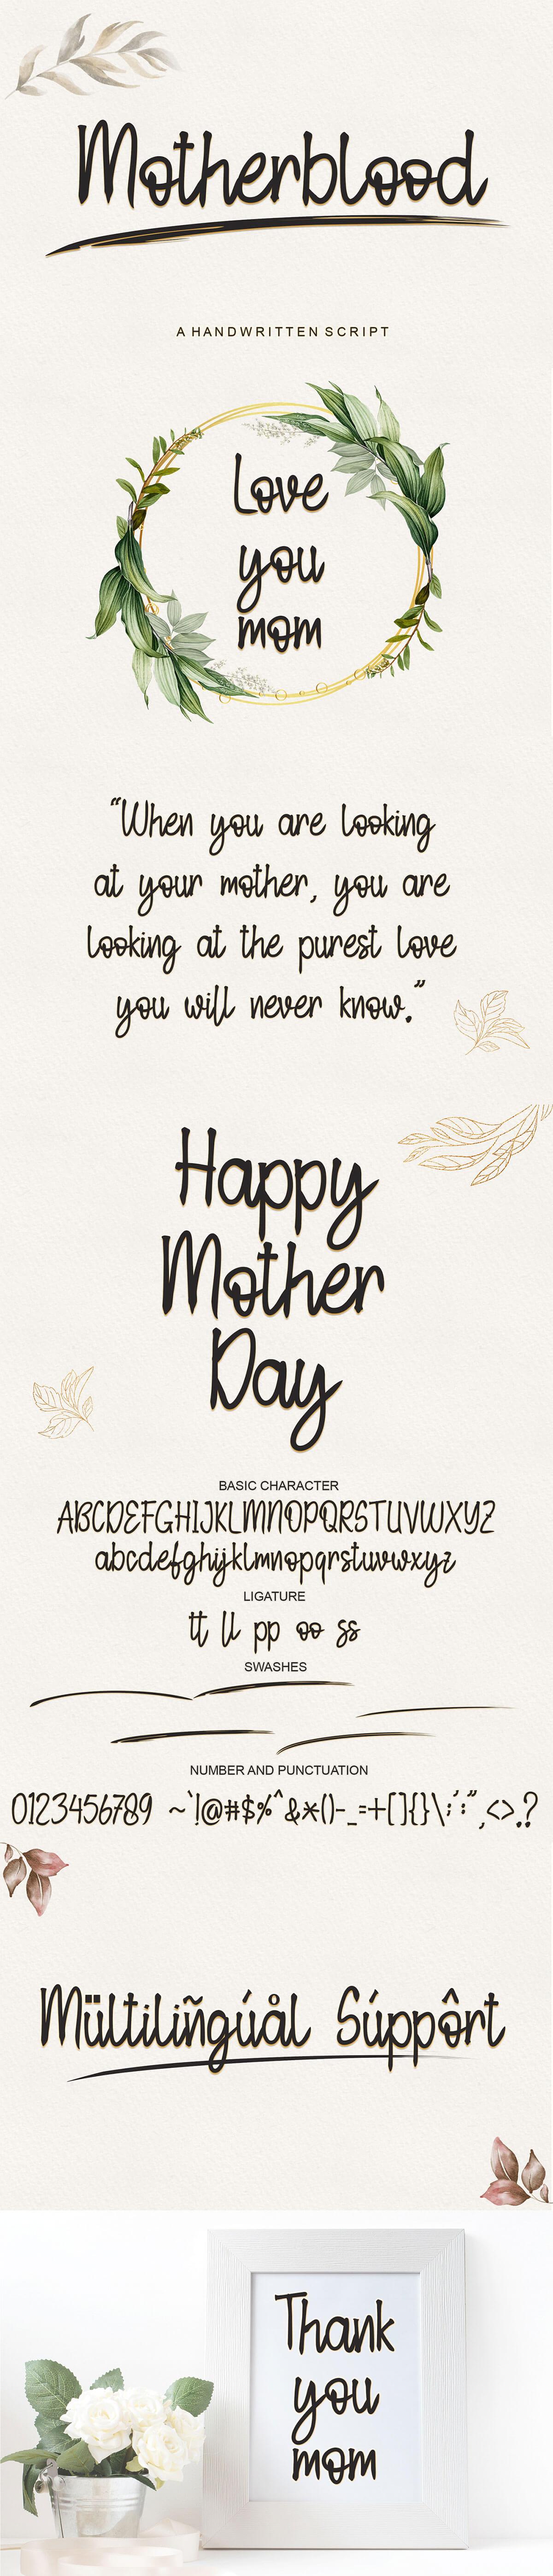 Free Motherblood Handwritten Script Font